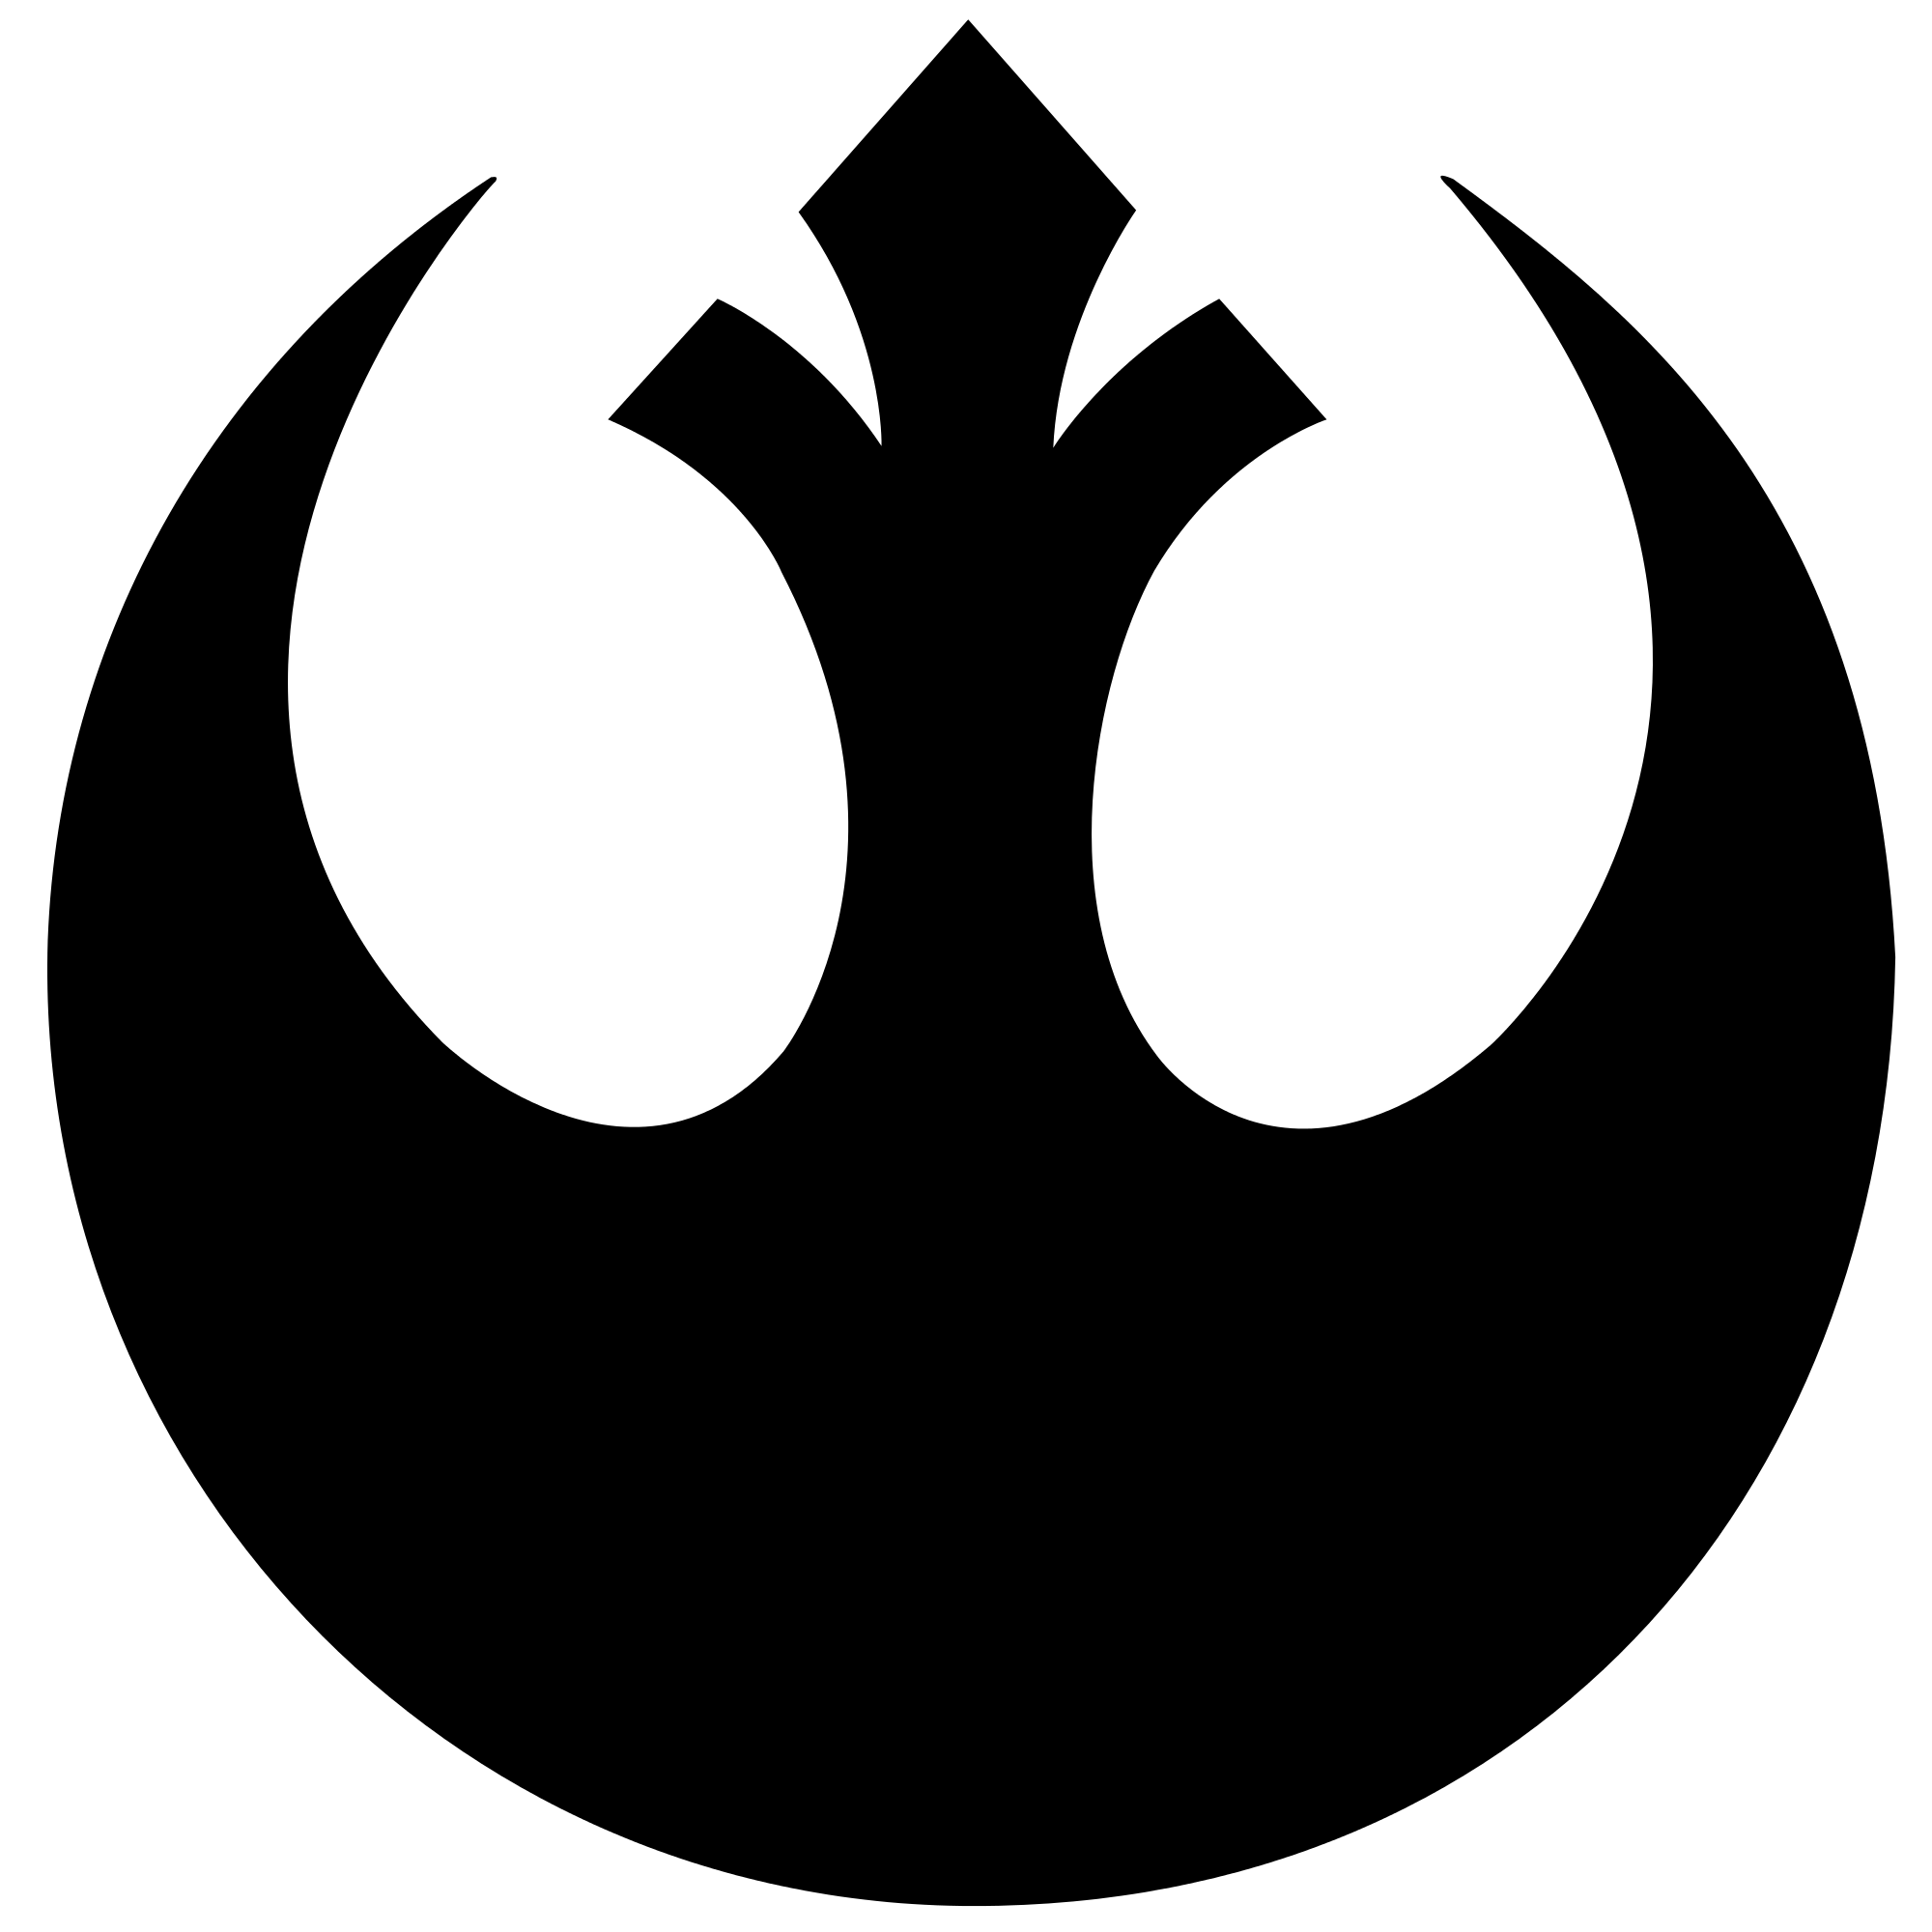 2000x2000 Filerebel Alliance Logo.svg